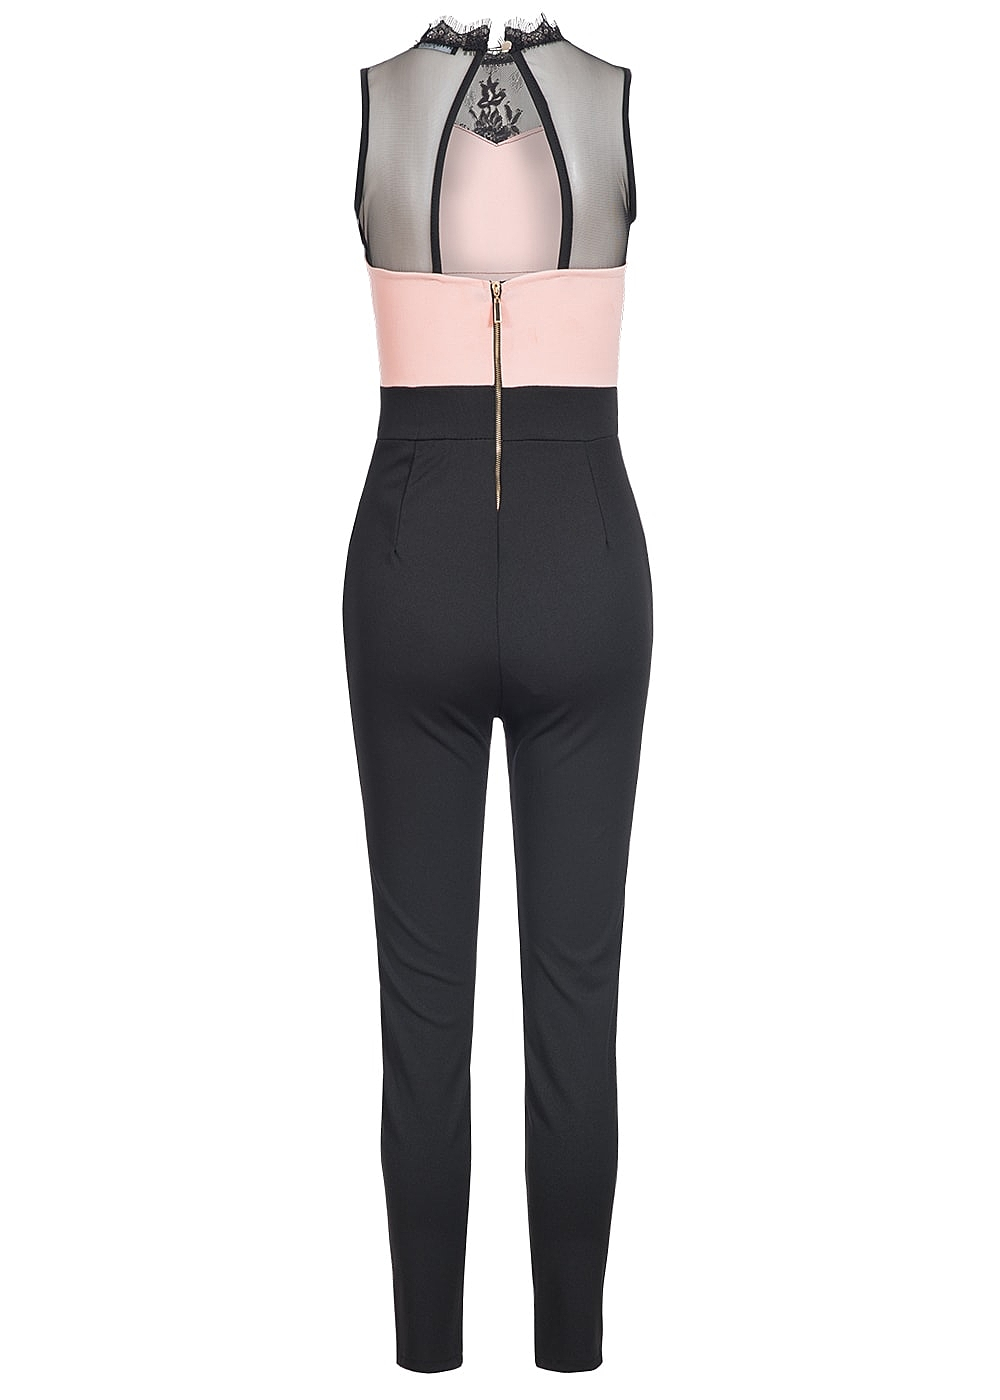 styleboom fashion damen long jumpsuit spitze schwarz rosa 77onlineshop. Black Bedroom Furniture Sets. Home Design Ideas